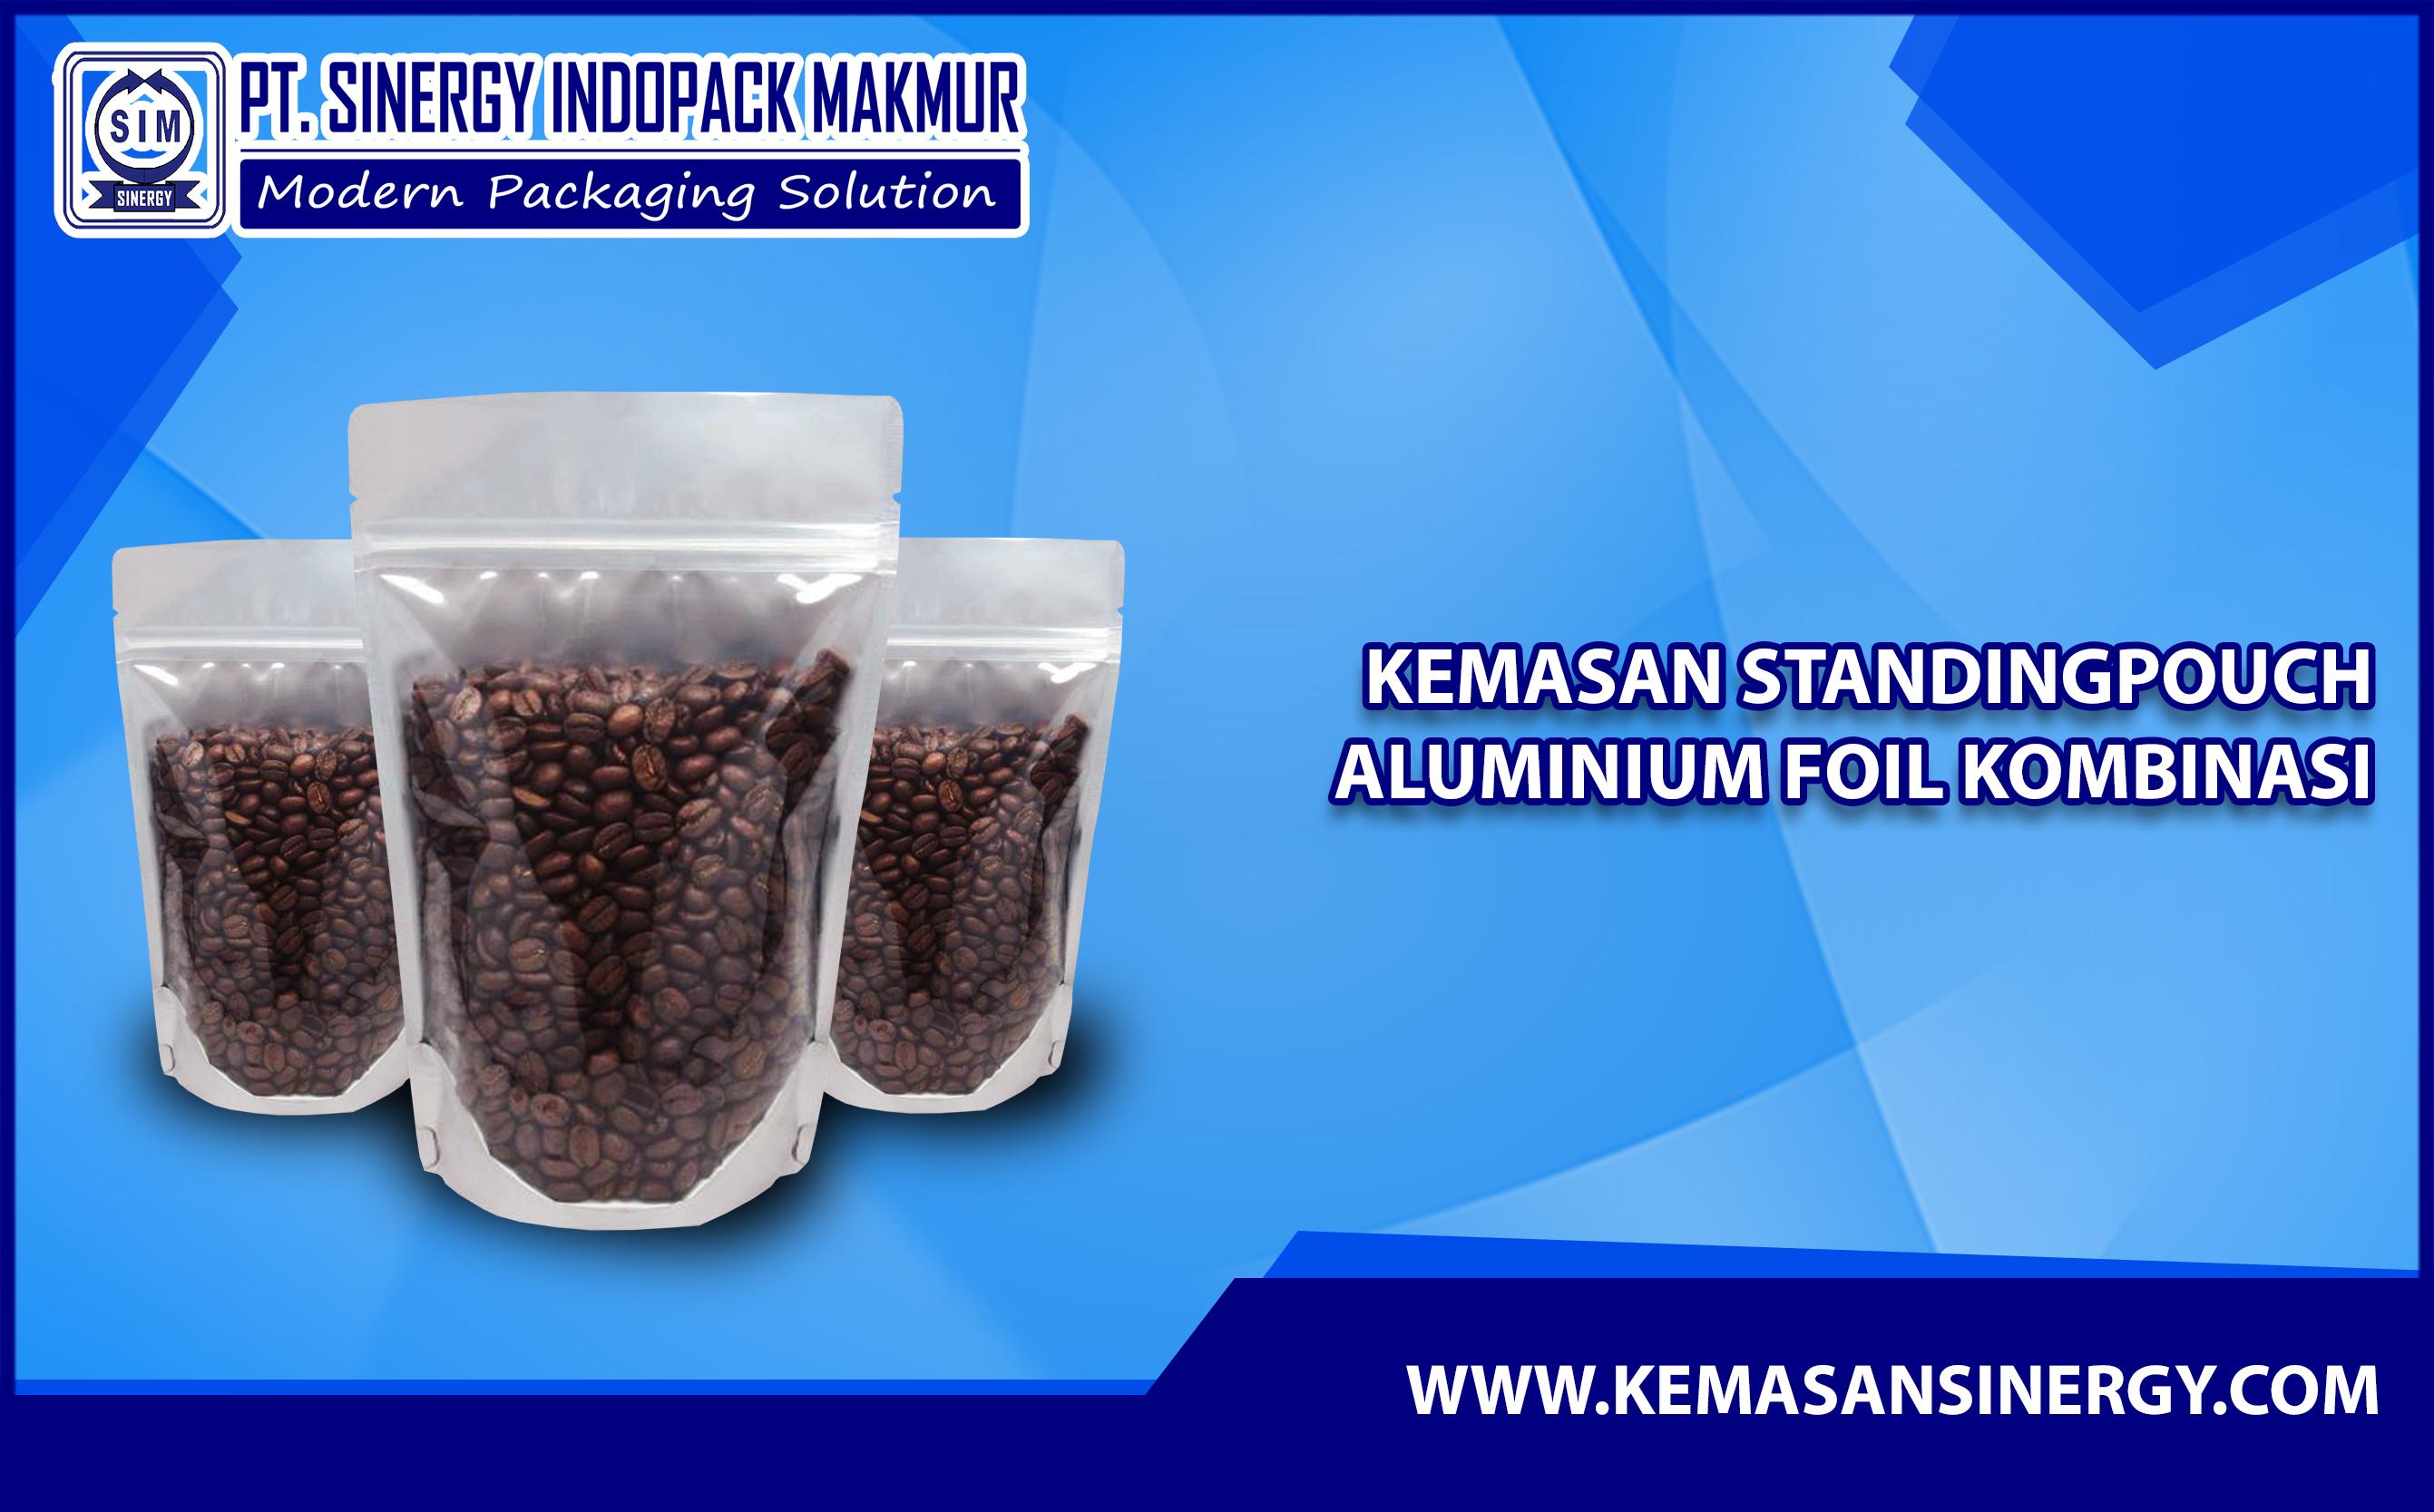 Kemasan Aluminium Foil (Alufoil Standing Pouch Kombinasi)